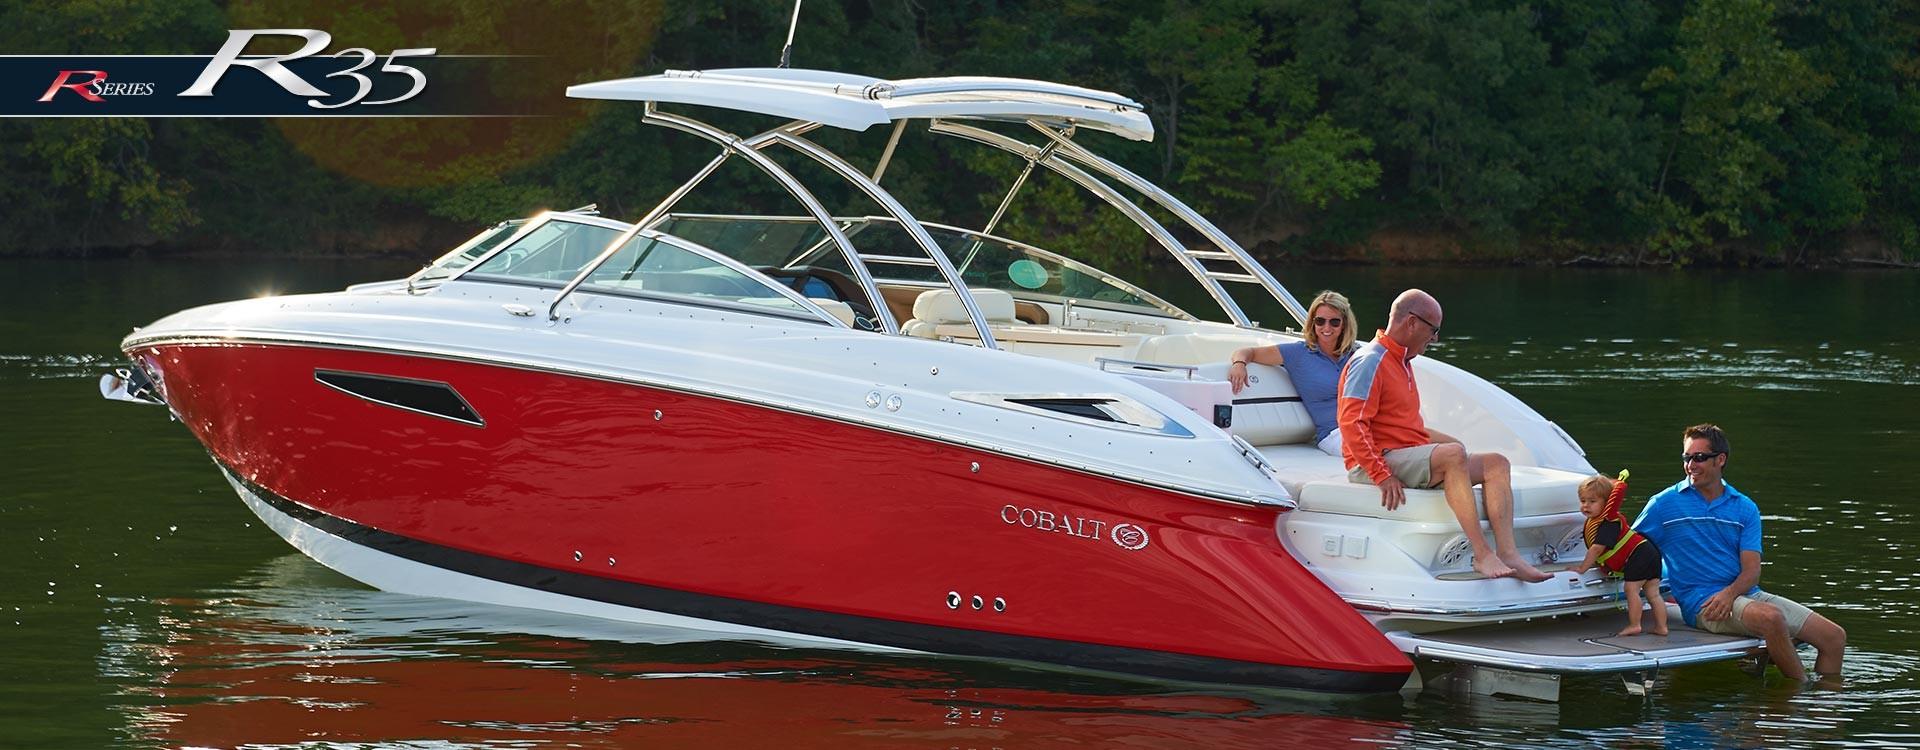 Buy a Cobalt Boat